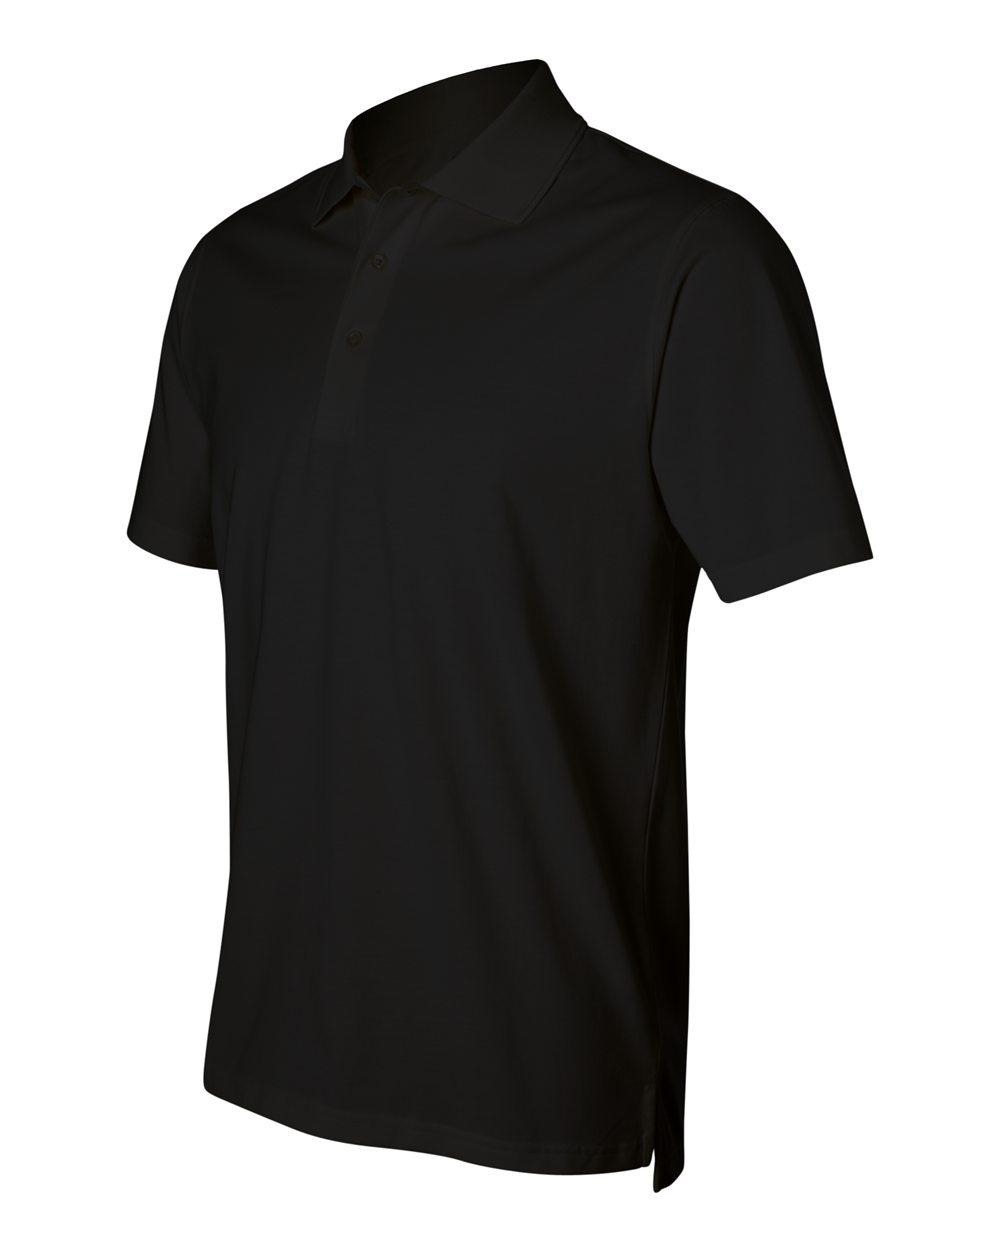 Izod 艾索德 13Z0062 灯芯布 Pima 舒适清爽运动衬衣T恤